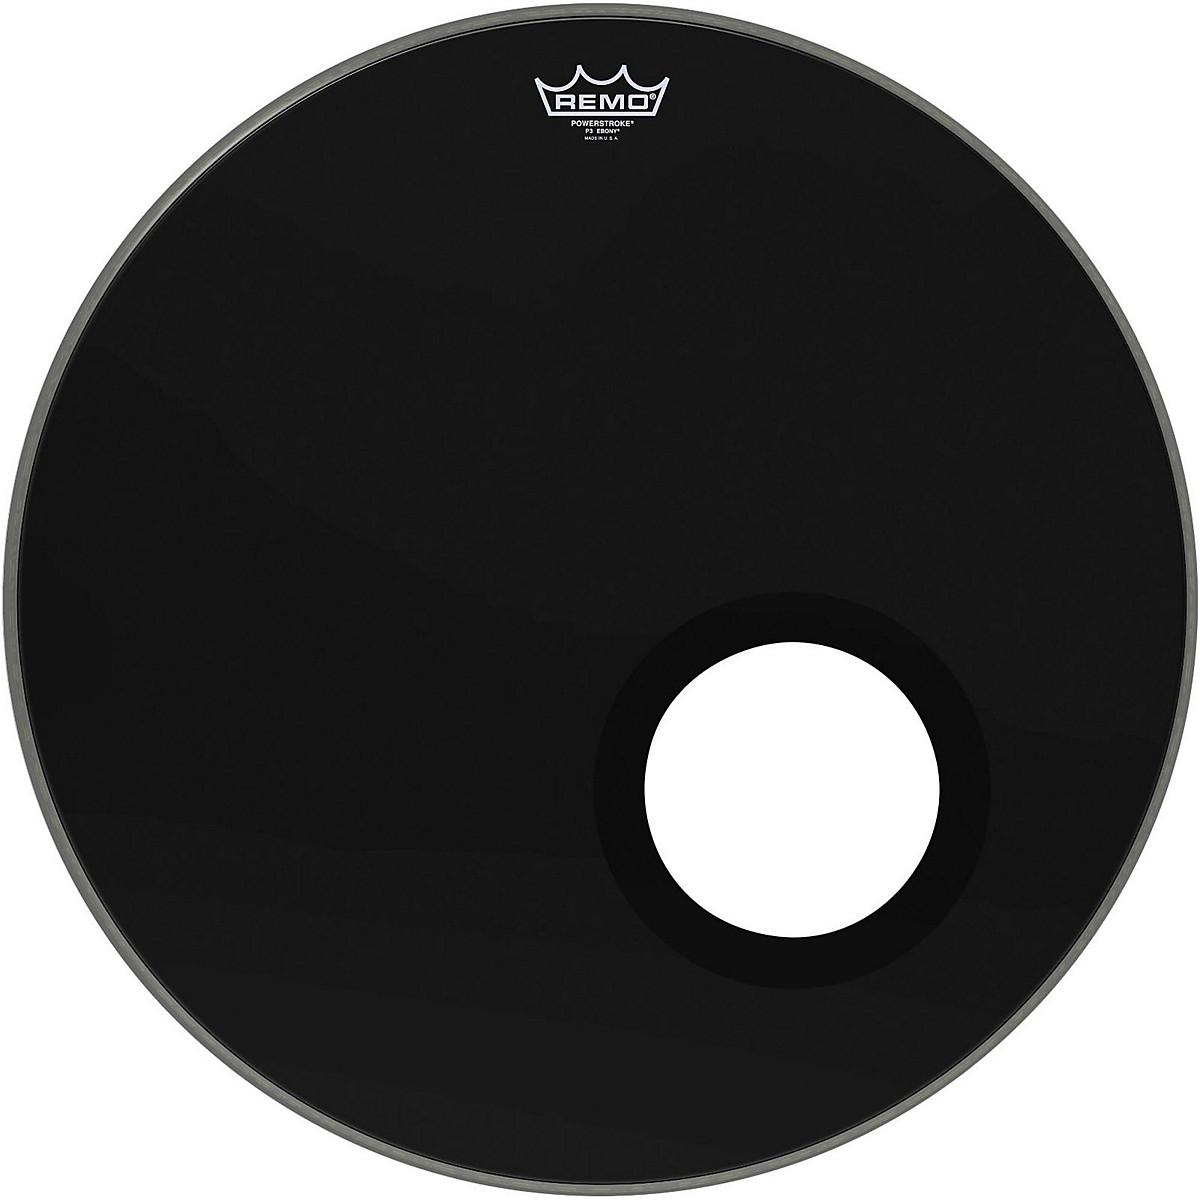 Remo Ebony Powerstroke 3 Resonant Bass Drumhead with 5 Inch Port Hole